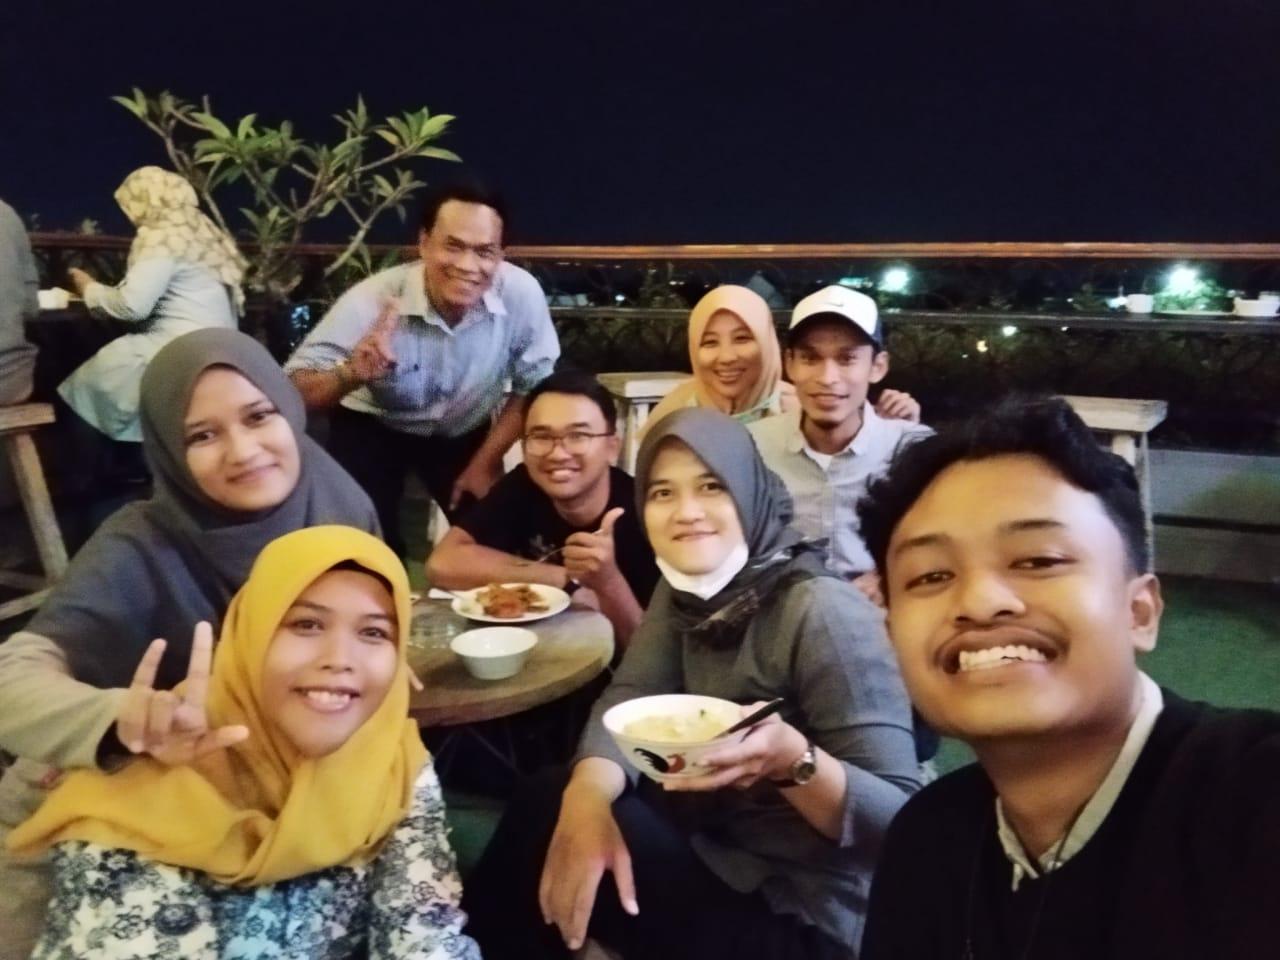 acara family, family gathering